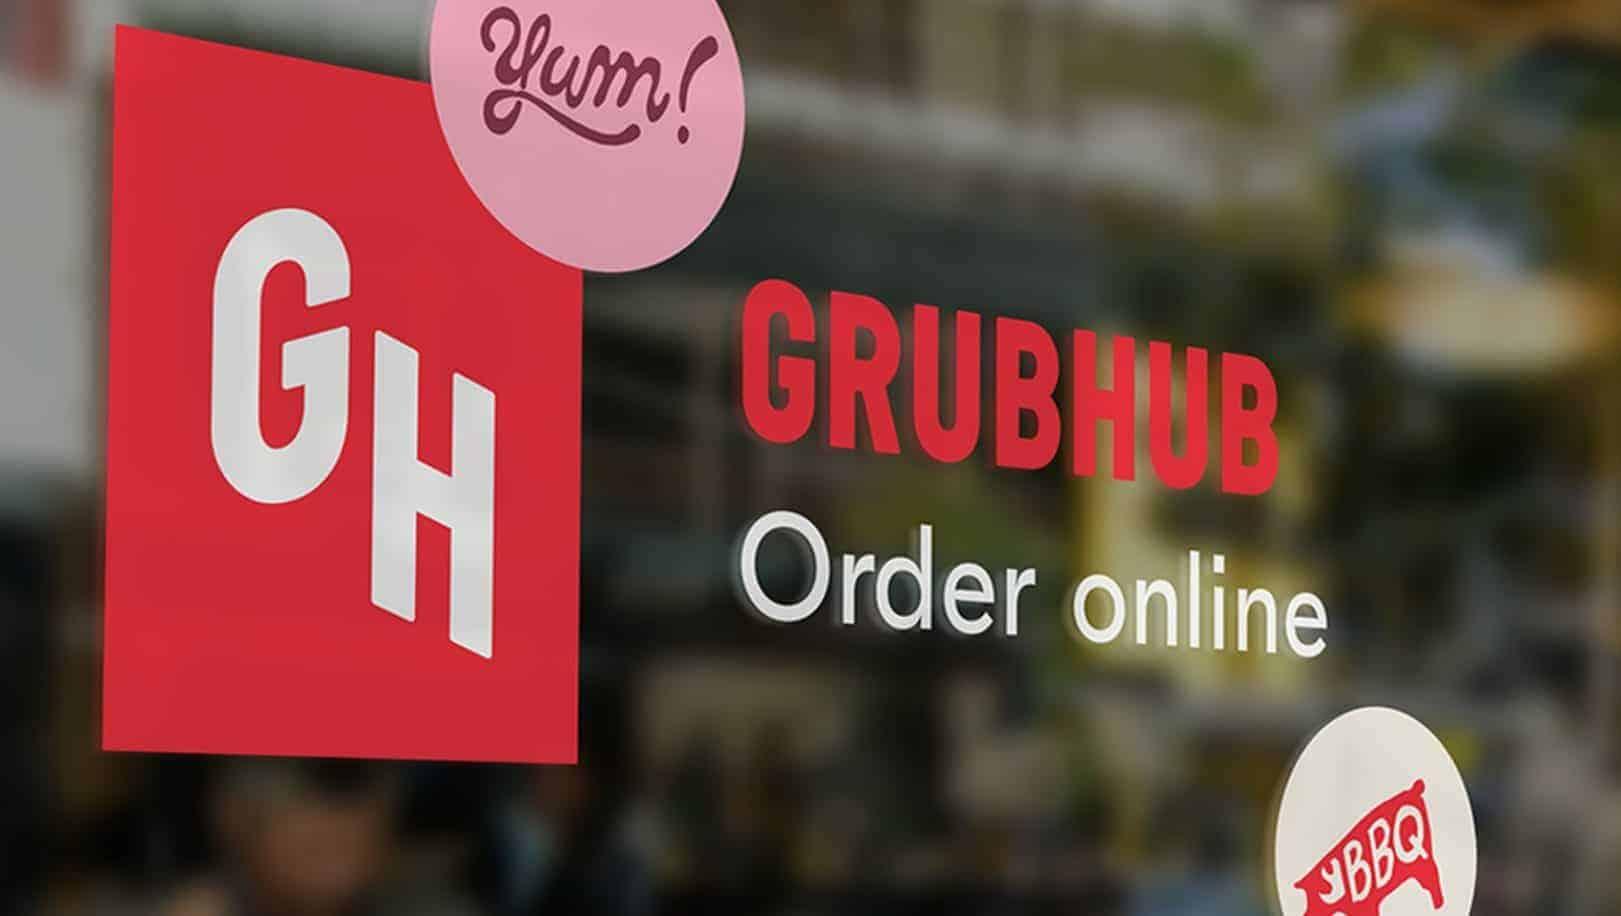 Grubhub Is Creating Fake Websites To Exploit The Restaurants